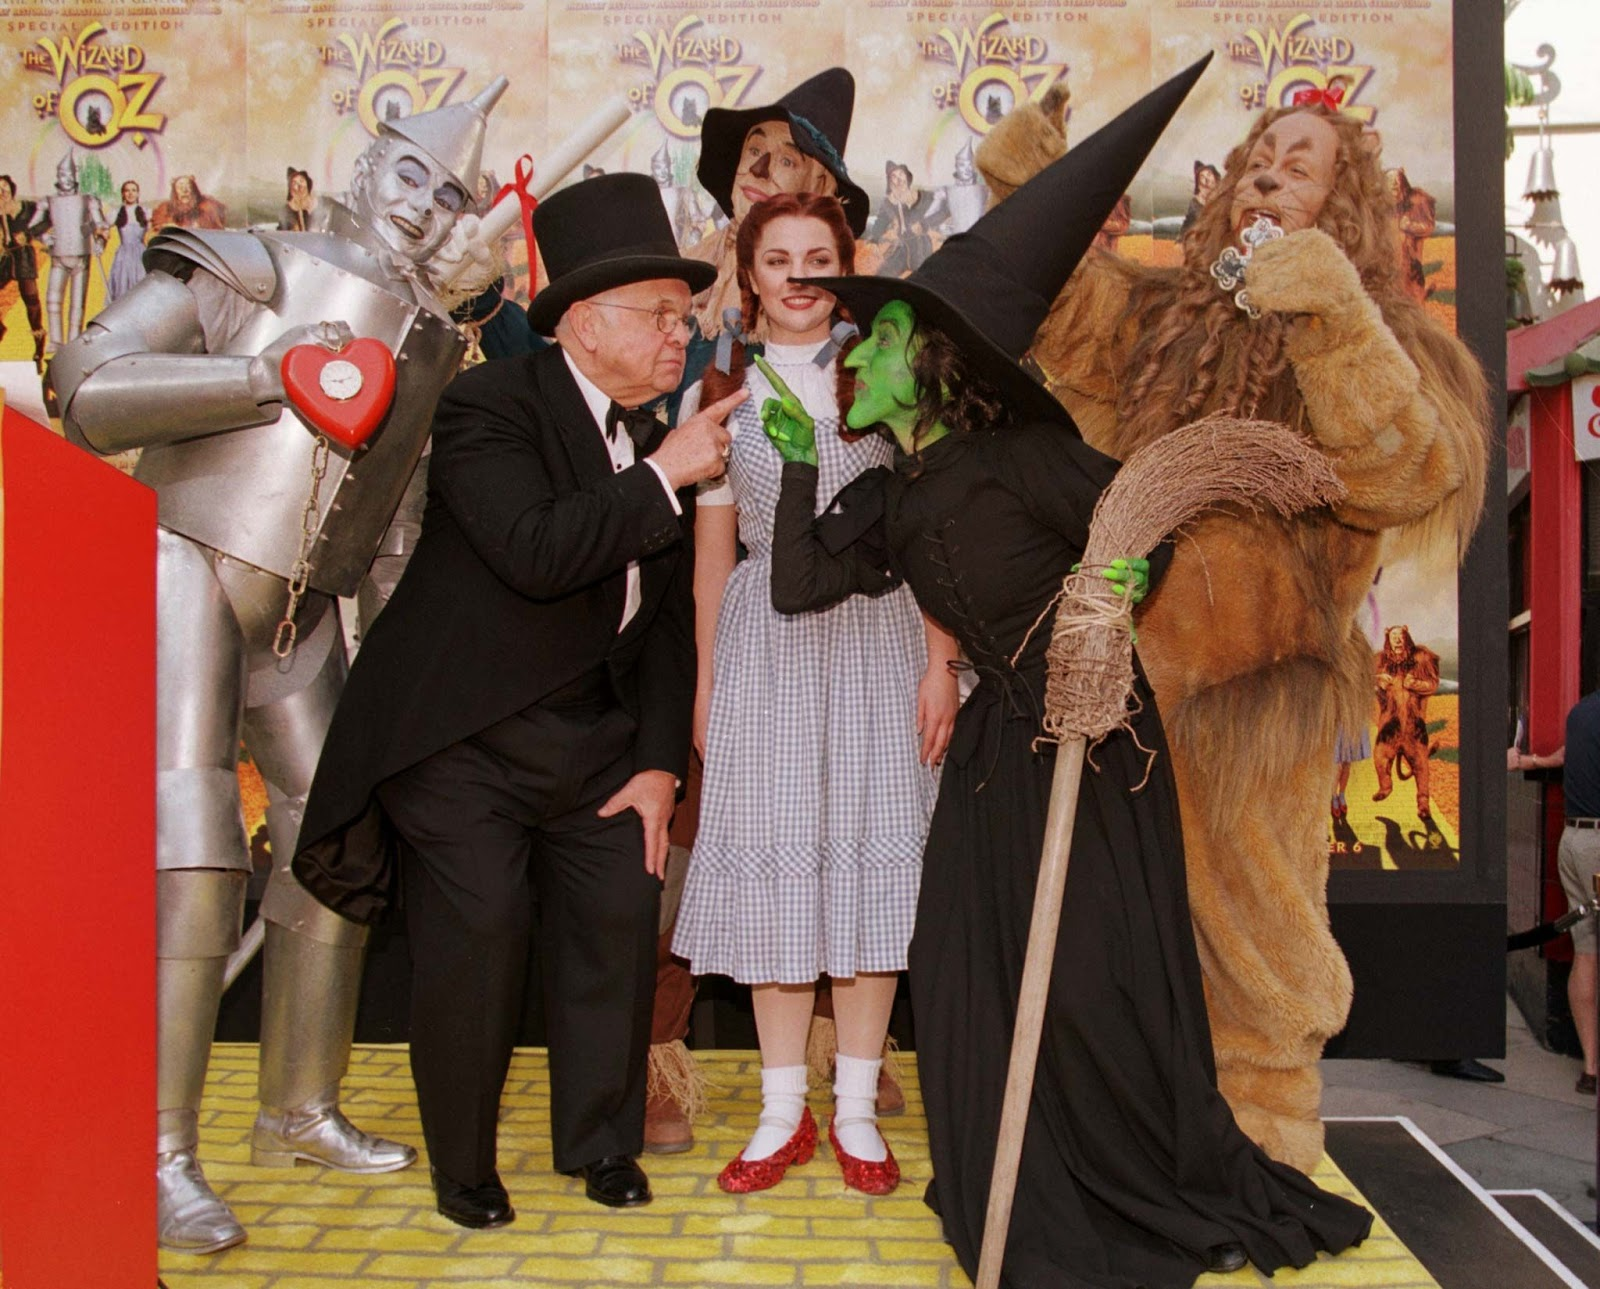 Billedresultat for wizard of oz